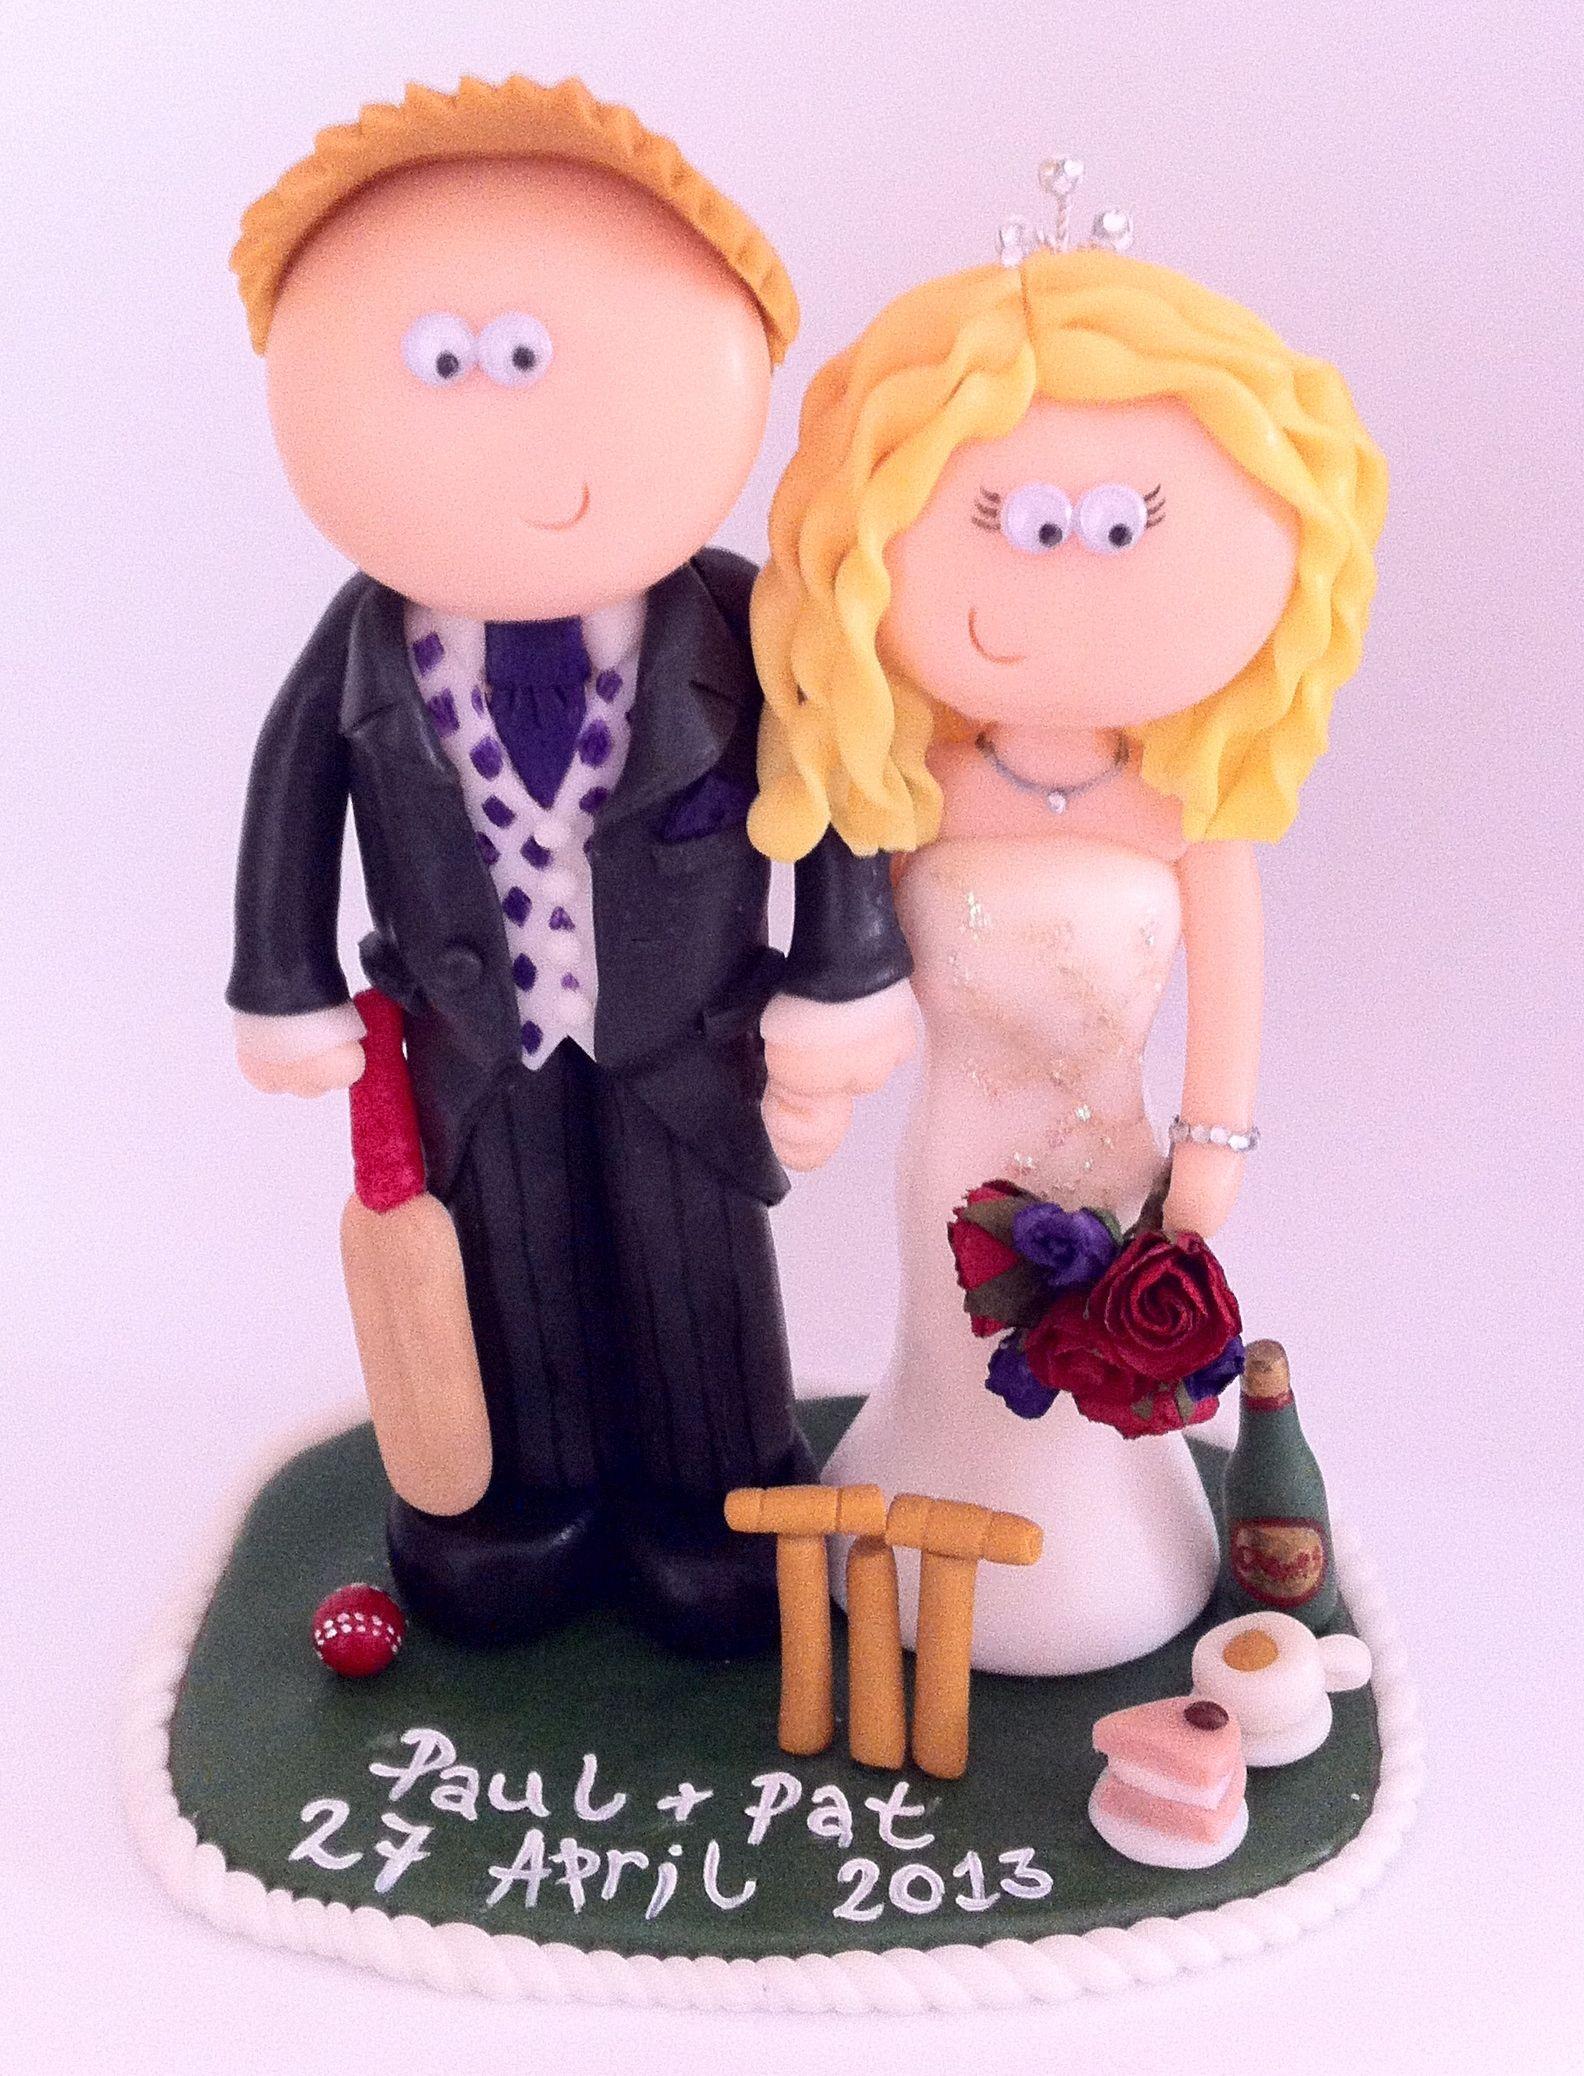 Cricket loving Wedding cake topper. | wedding | Pinterest | Wedding ...